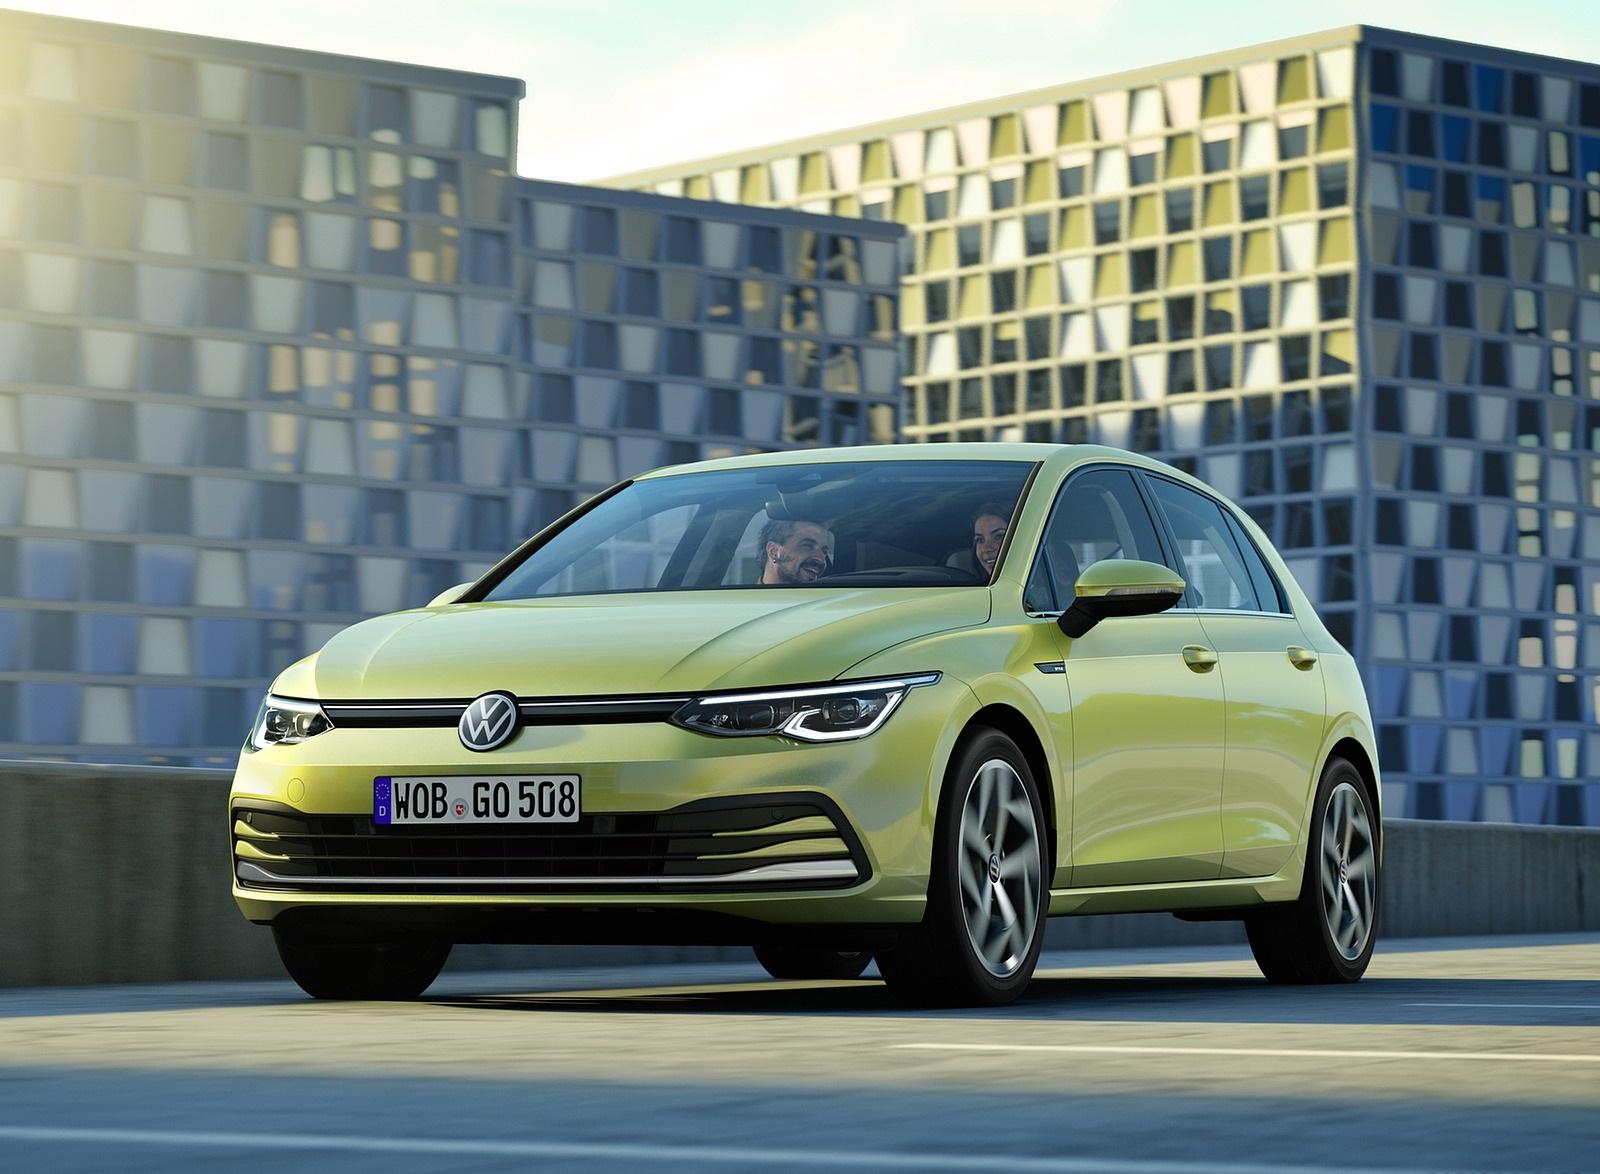 2020 Volkswagen Golf Mk8 Front Three-Quarter Wallpapers (9)